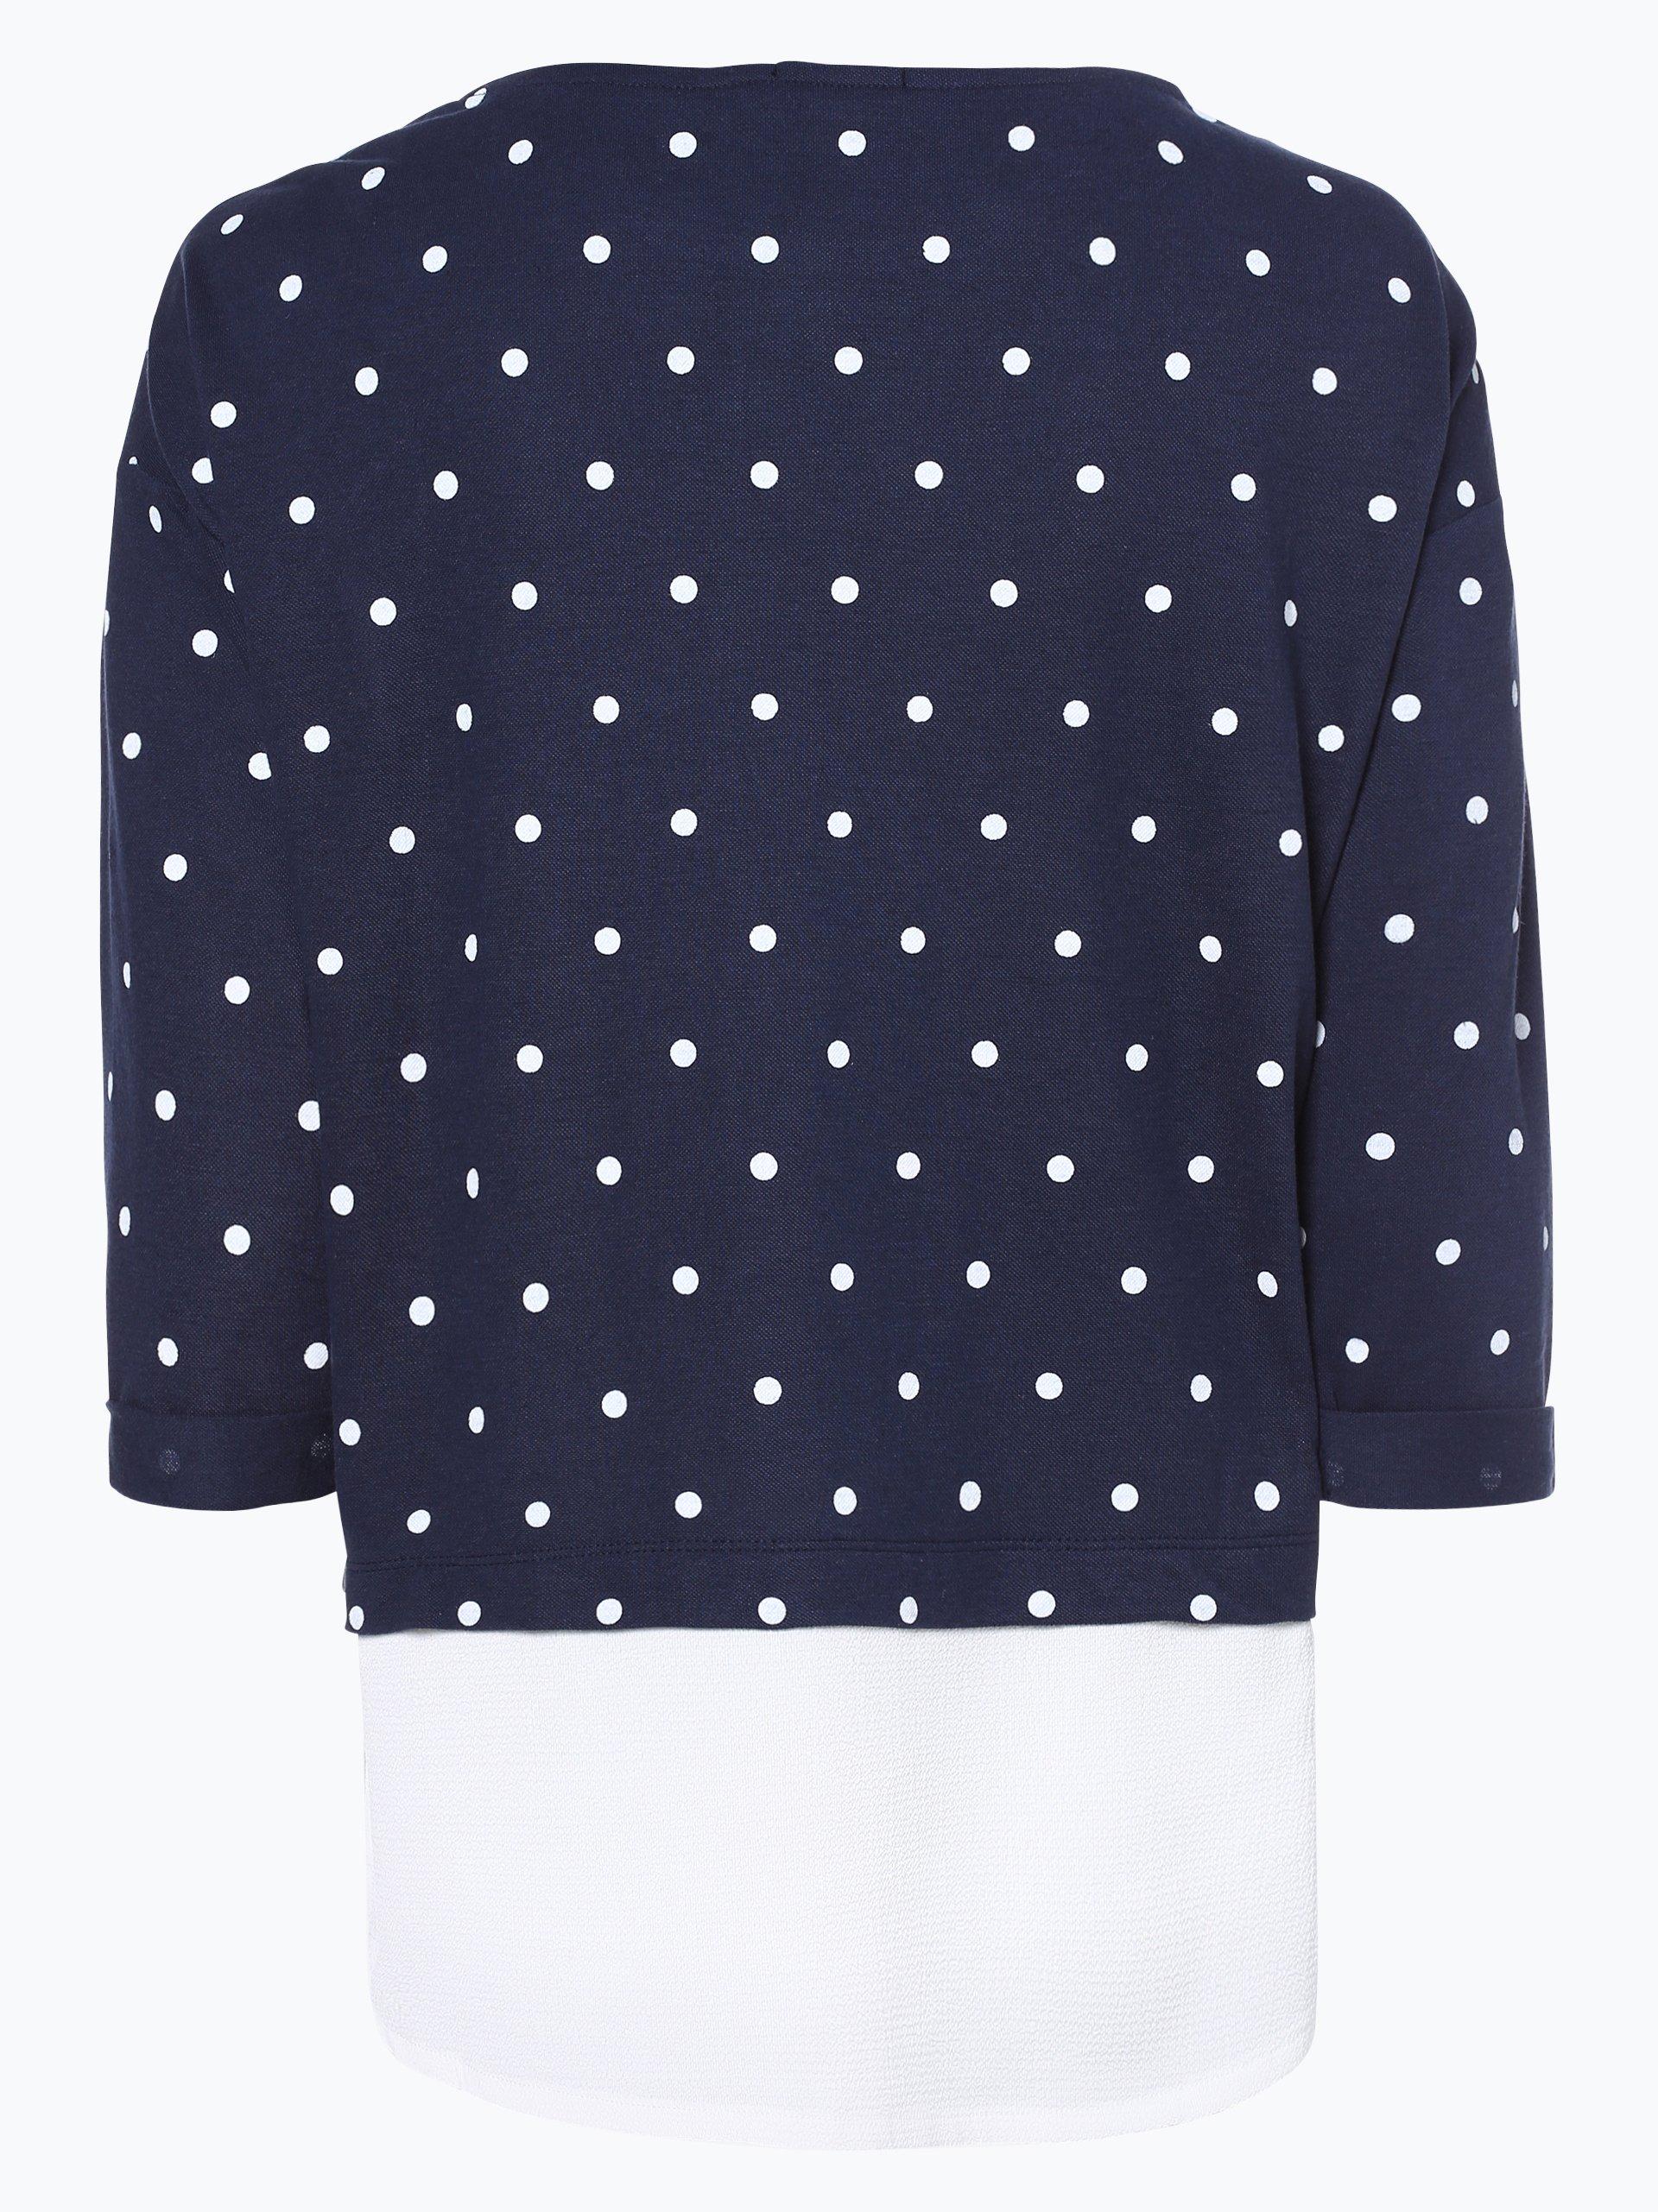 Esprit Casual Damen Shirt